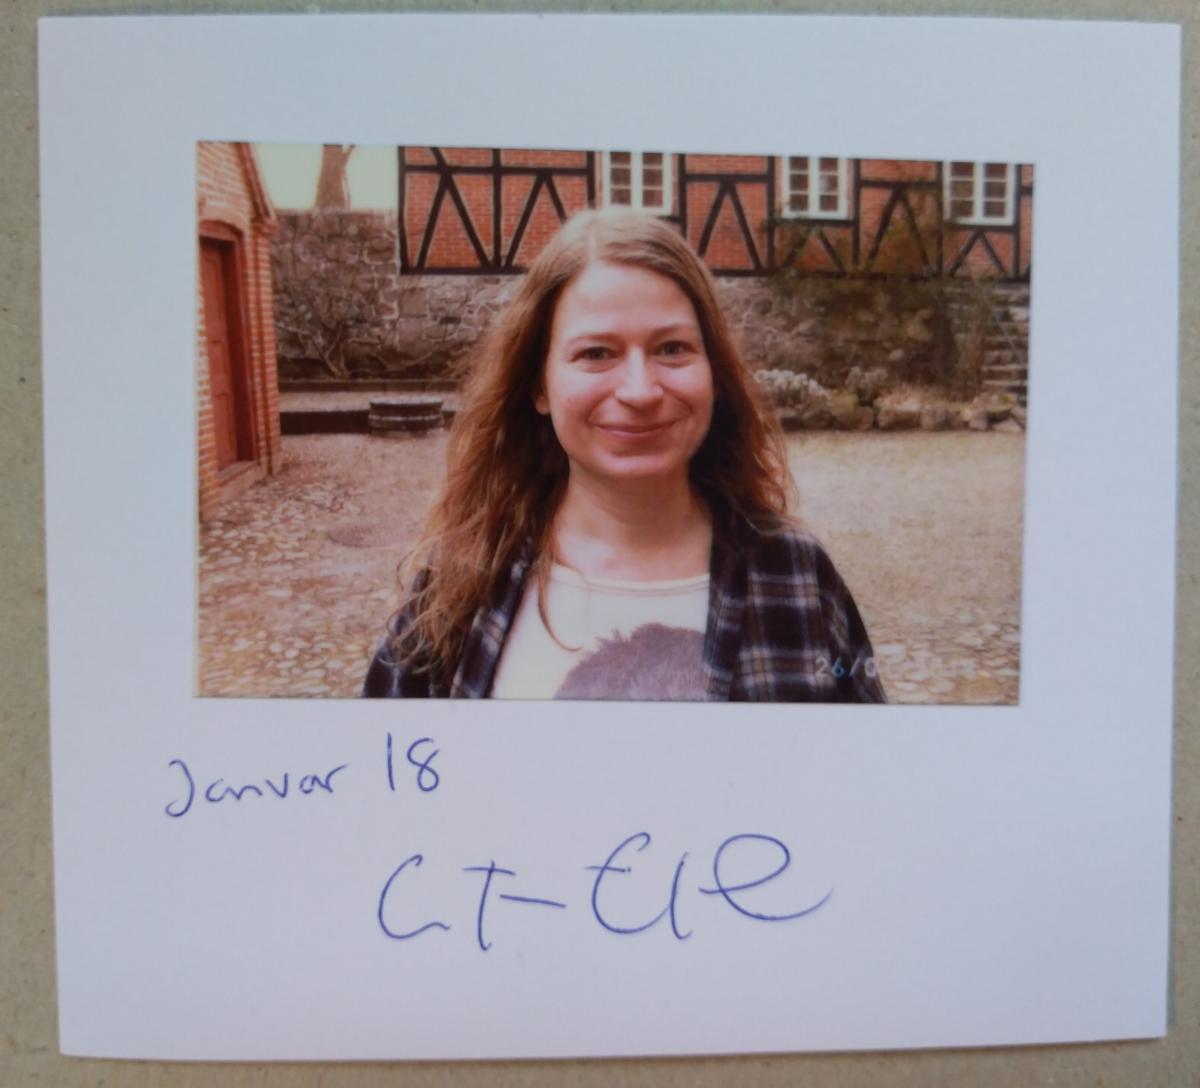 01-18 Christina Englund